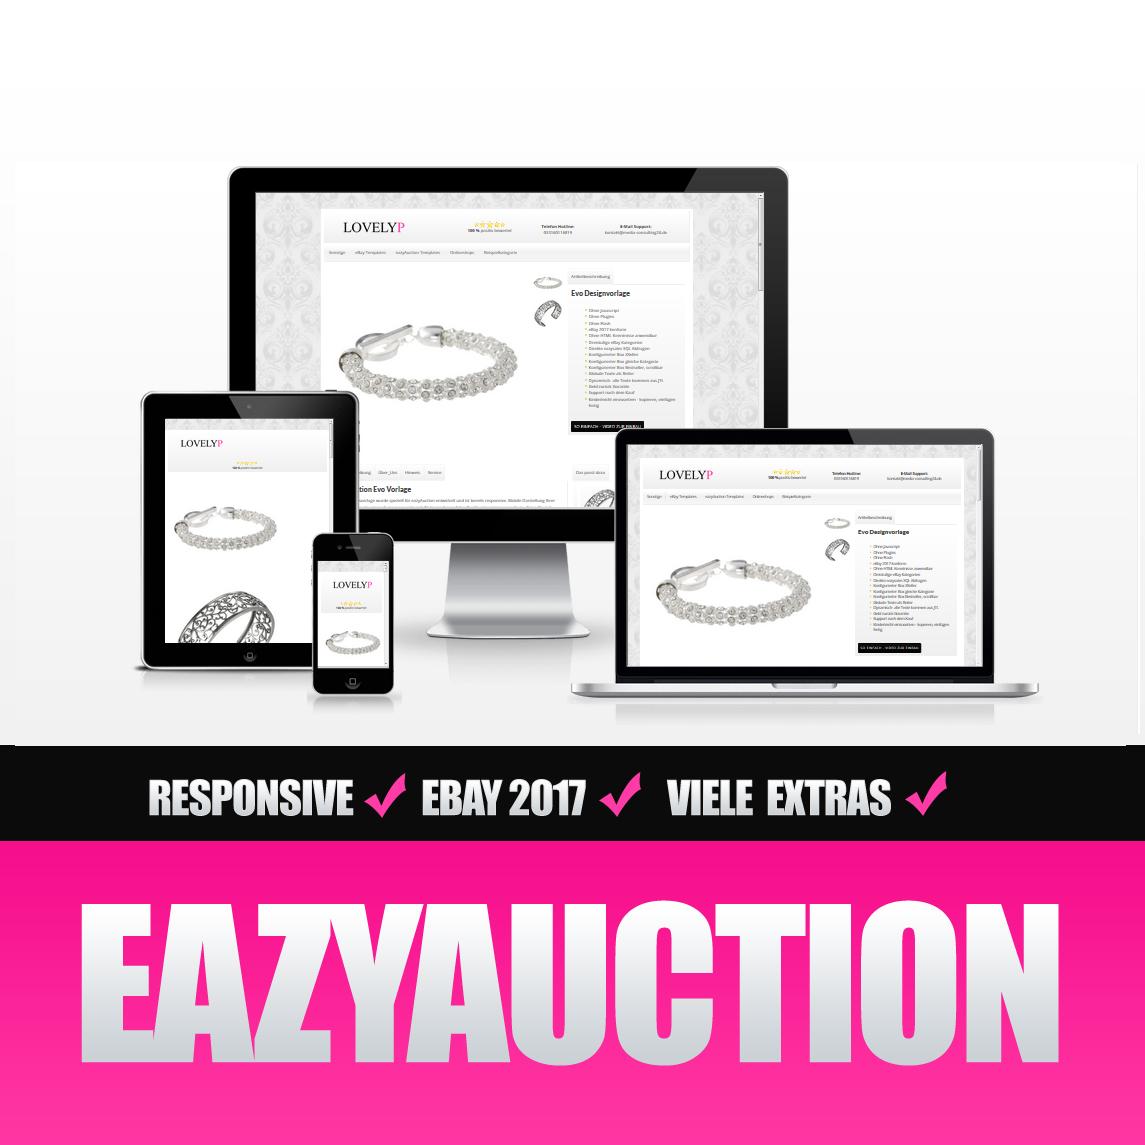 Eazyauction eBay Template 2017 #2-5